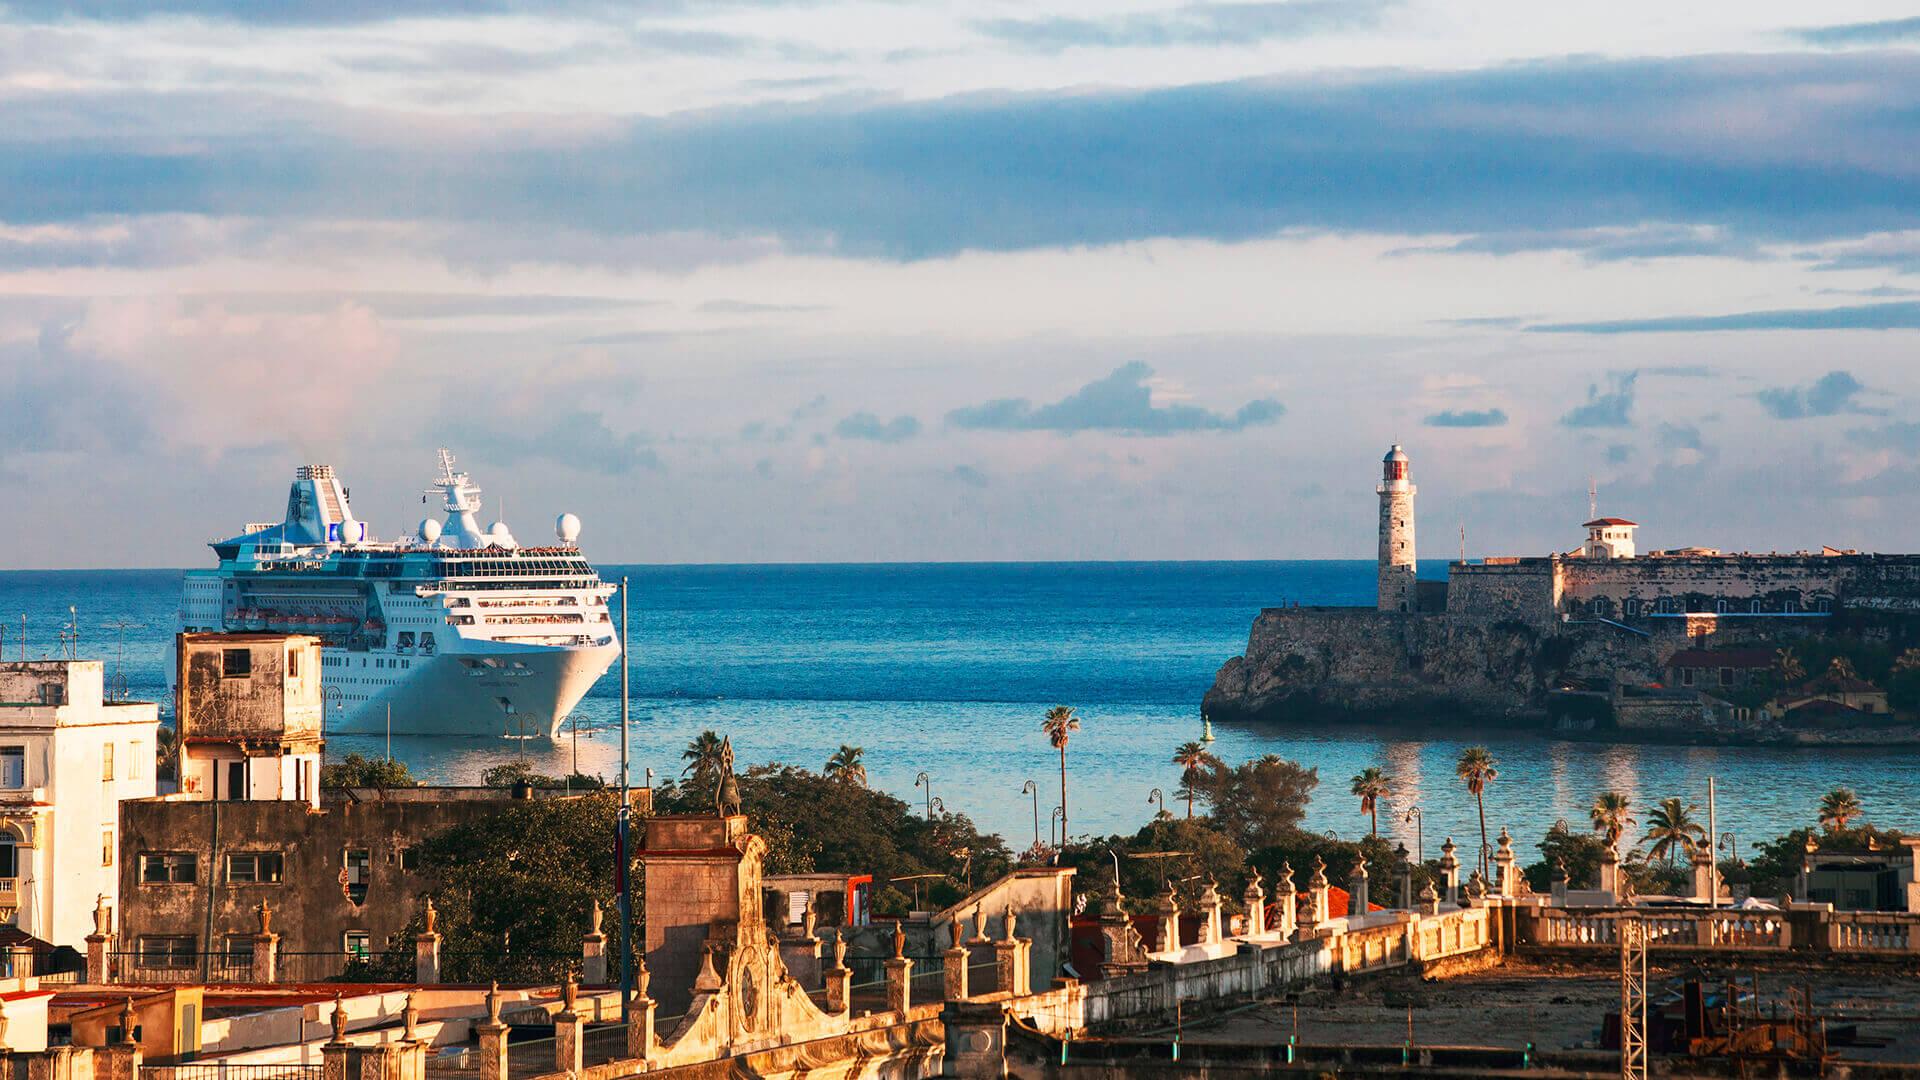 Destination: Cruise Voyages of 2019